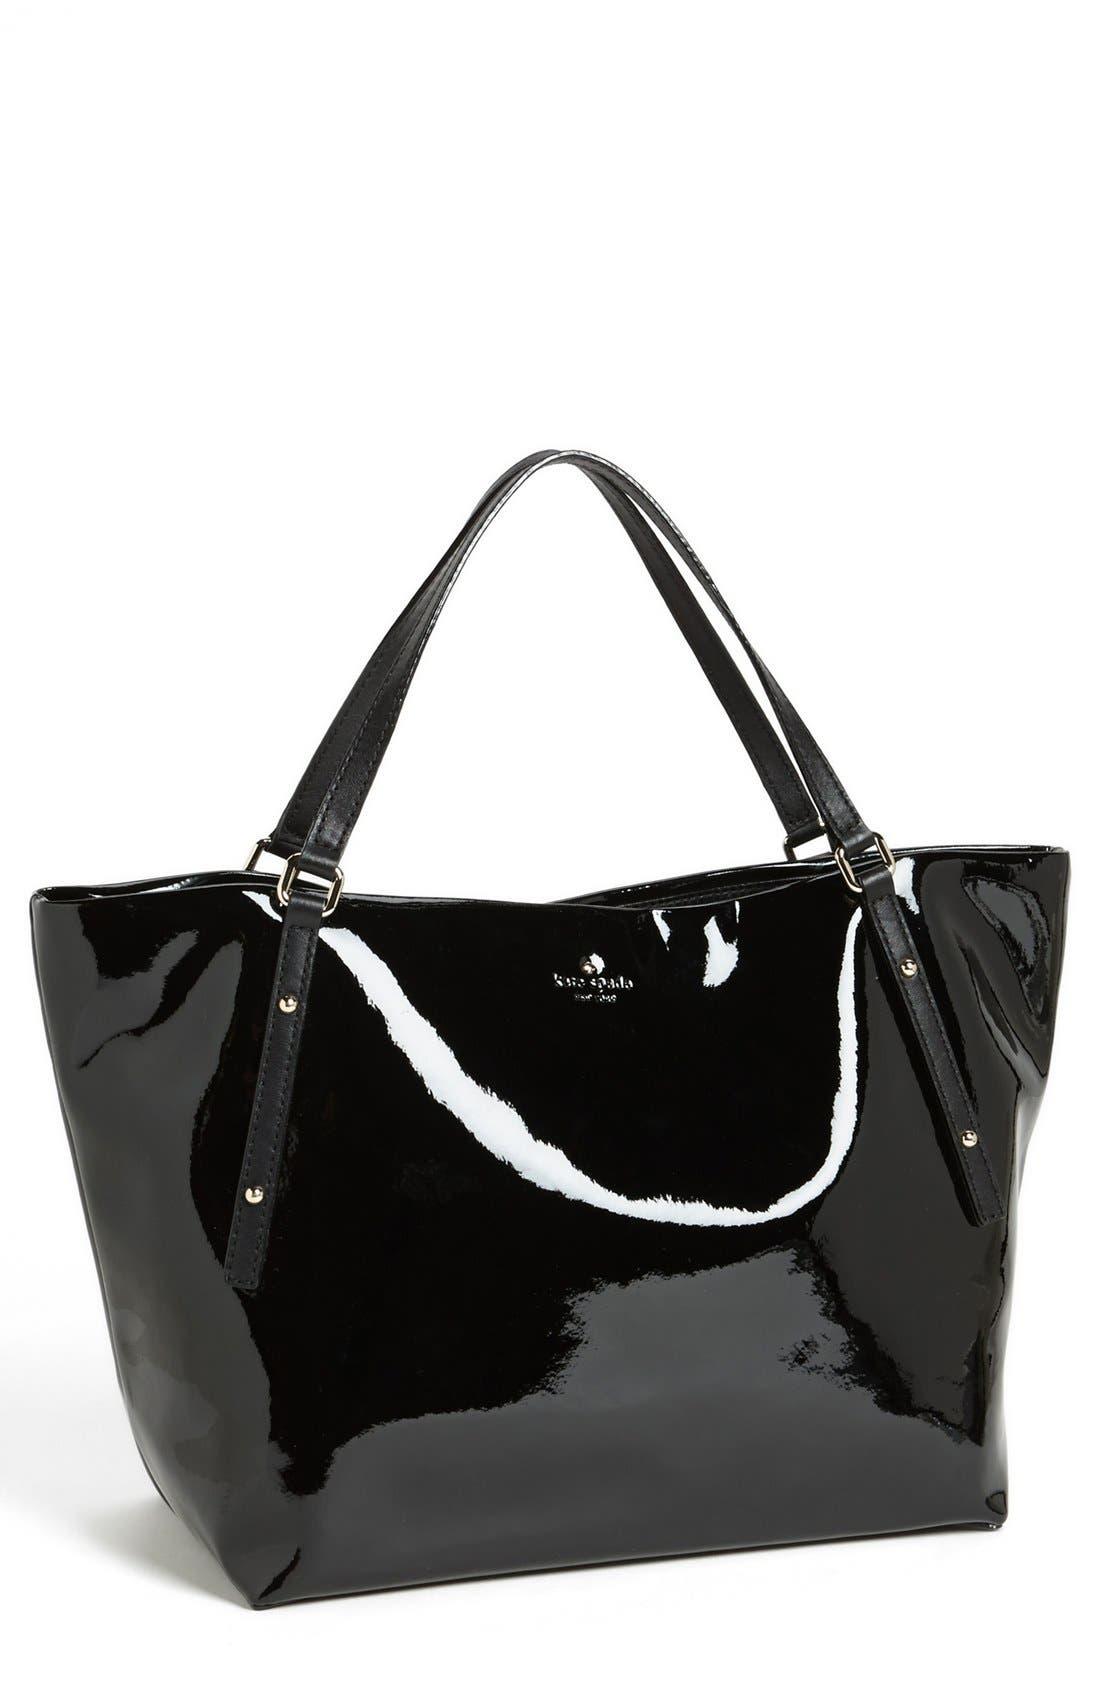 'jackson square - sophie' patent leather tote, large,                             Main thumbnail 1, color,                             001